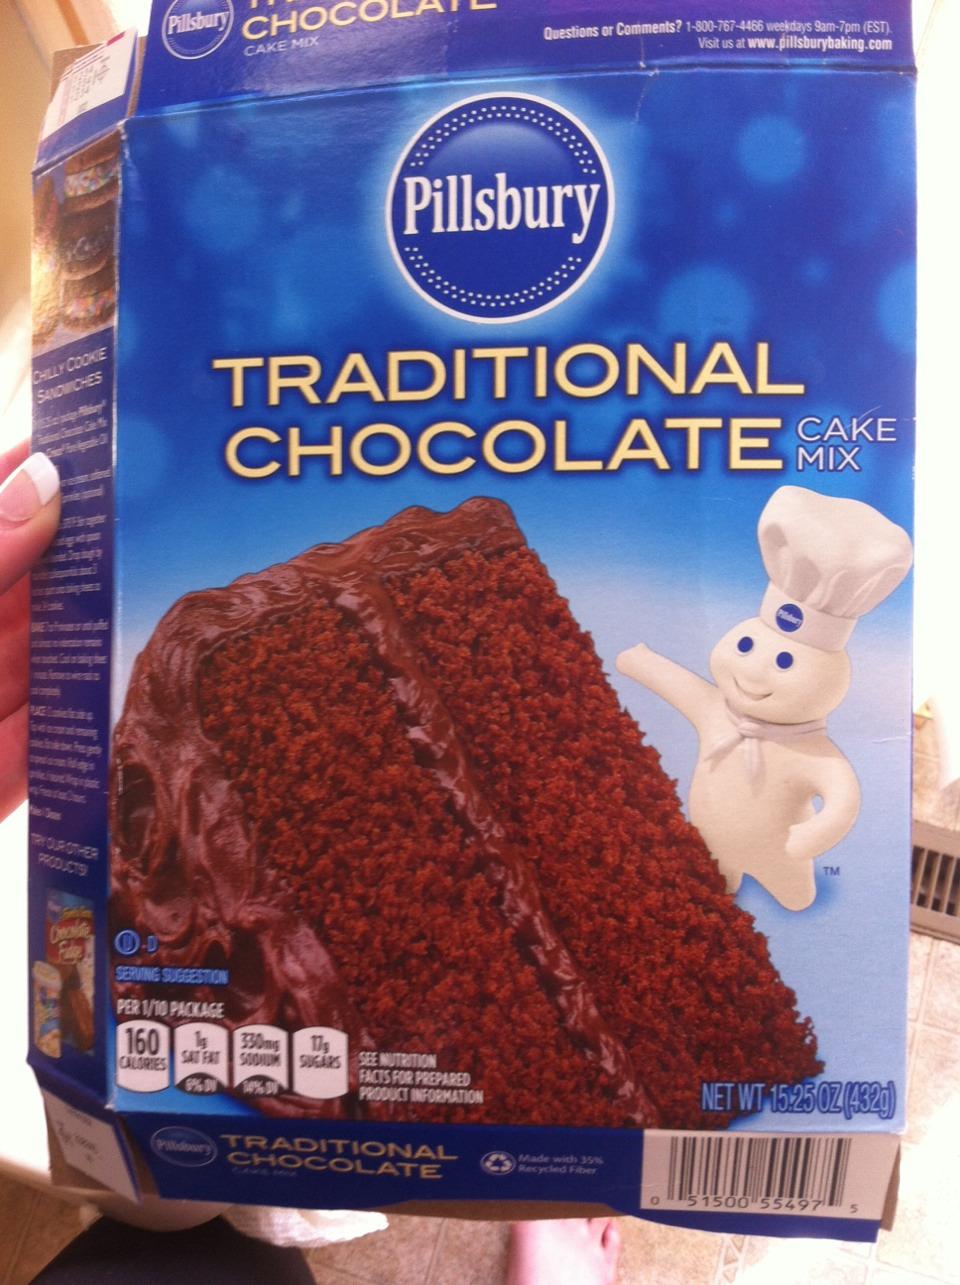 Any kind of cake mix, I used Pillsbury Traditional Chocolate cake mix